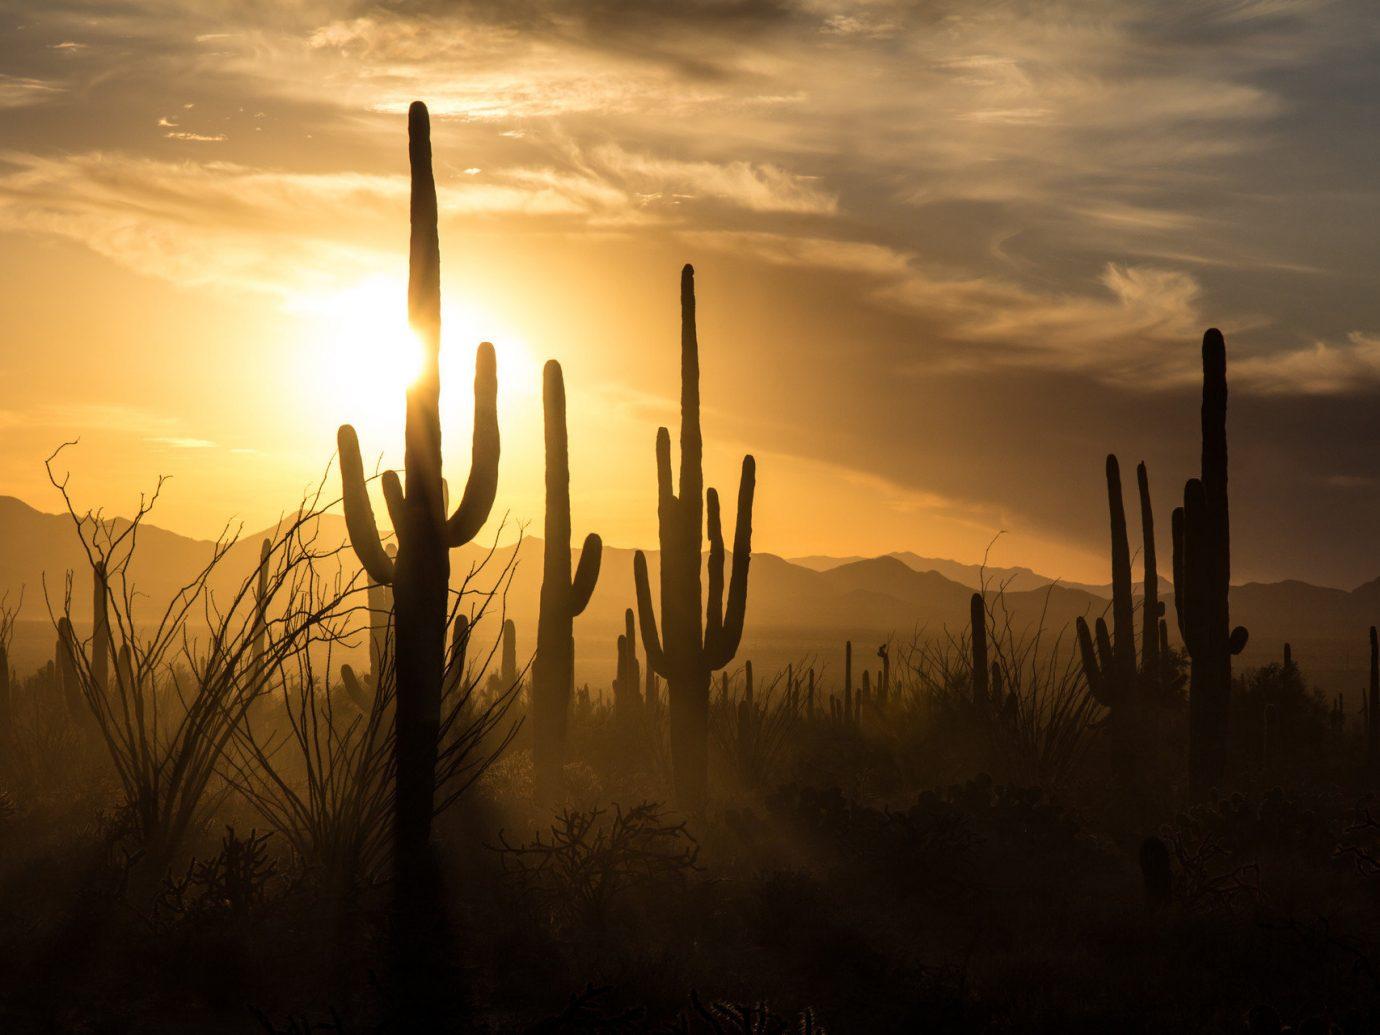 Trip Ideas sky outdoor Sunset plant Sun traffic cactus light Nature sunrise atmospheric phenomenon clouds cloud dawn horizon morning atmosphere setting evening sunlight dusk reflection cloudy mist day